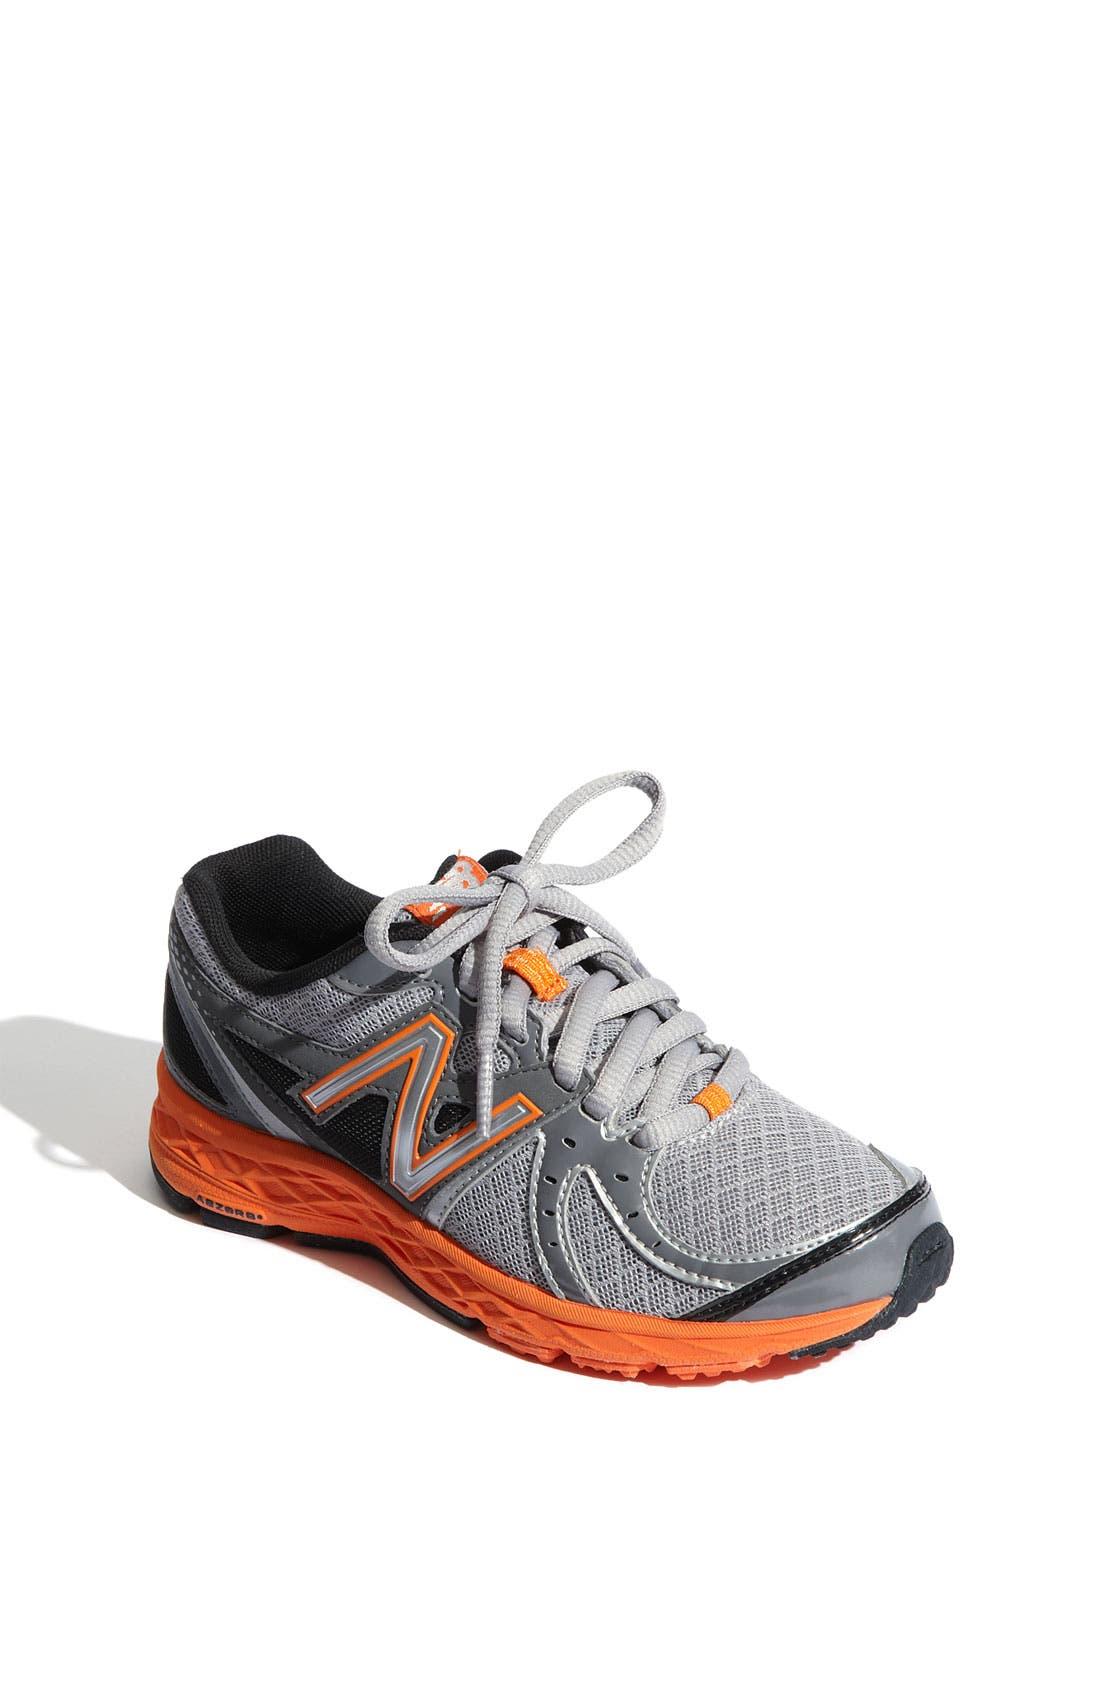 Alternate Image 1 Selected - New Balance '790' Trail Running Shoe (Toddler, Little Kid & Big Kid)